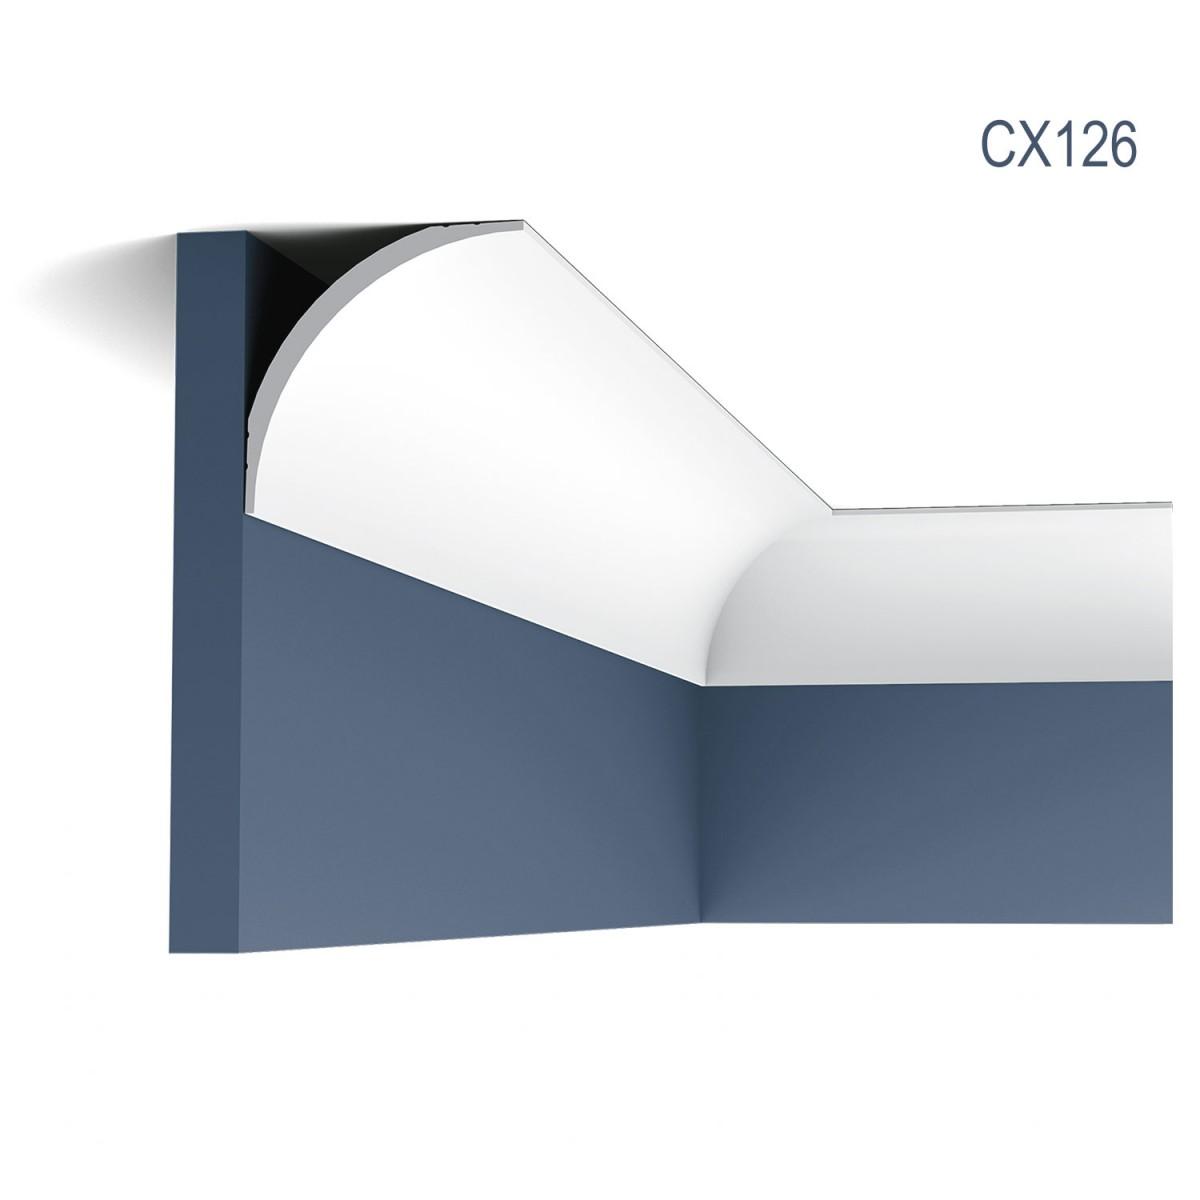 Cornisa Axxent CX126, Dimensiuni: 200 X 8.7 X 8.7 cm, Orac Decor